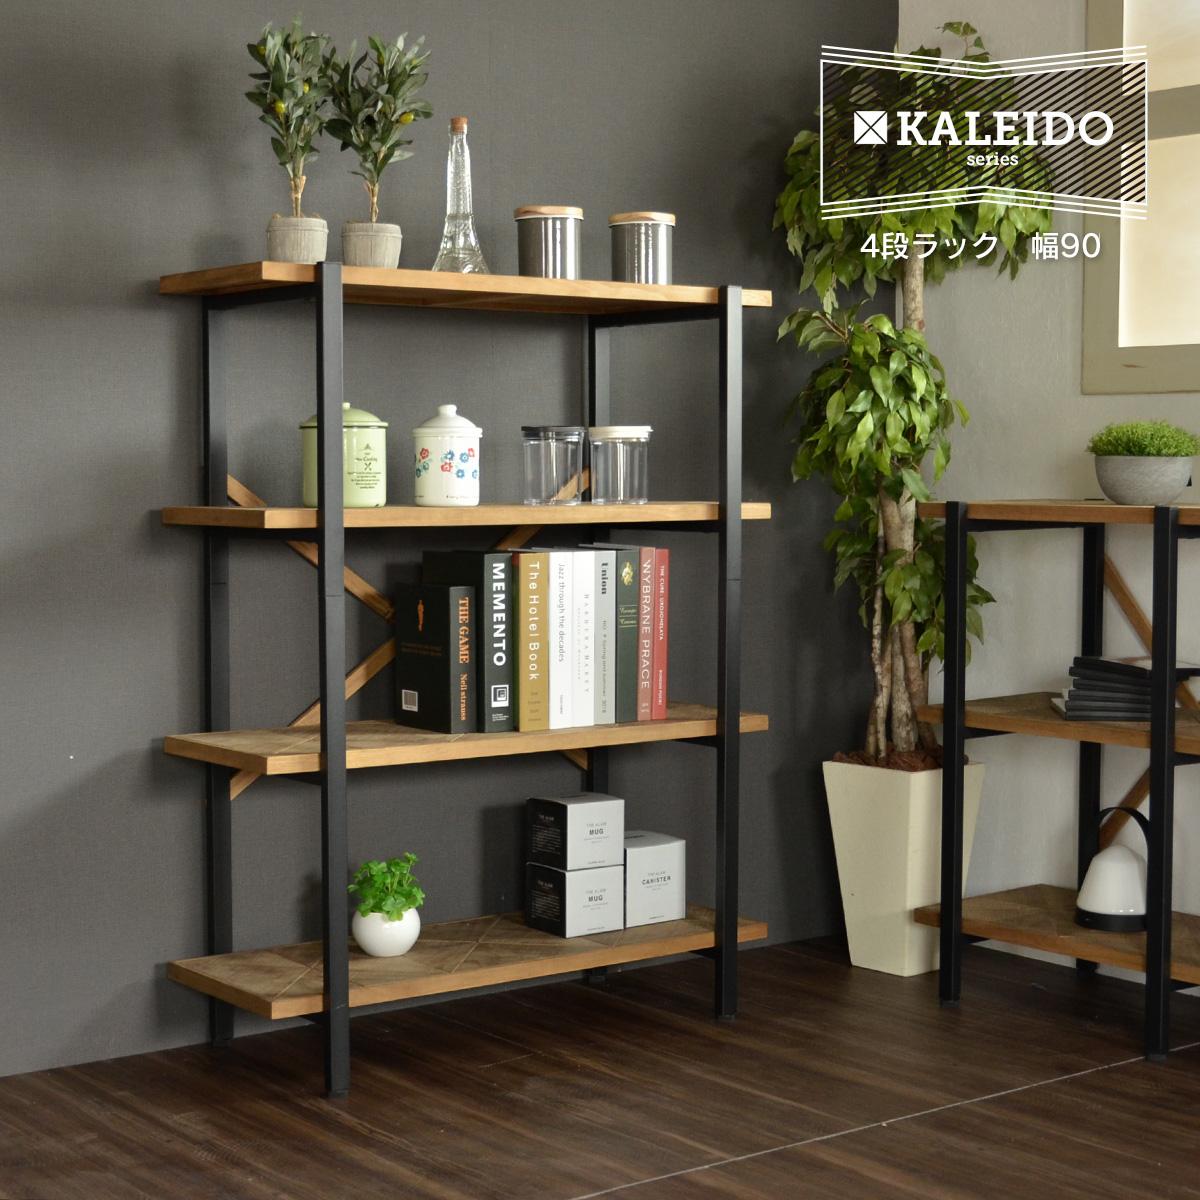 KALEIDO カレイド 4段ラック 幅90 オープン 収納 木製 棚 本棚 シェルフ 間仕切り ディスプレイ コンパクト スリム 省スペース 一人暮らし リビング おしゃれ デザインビンテージ